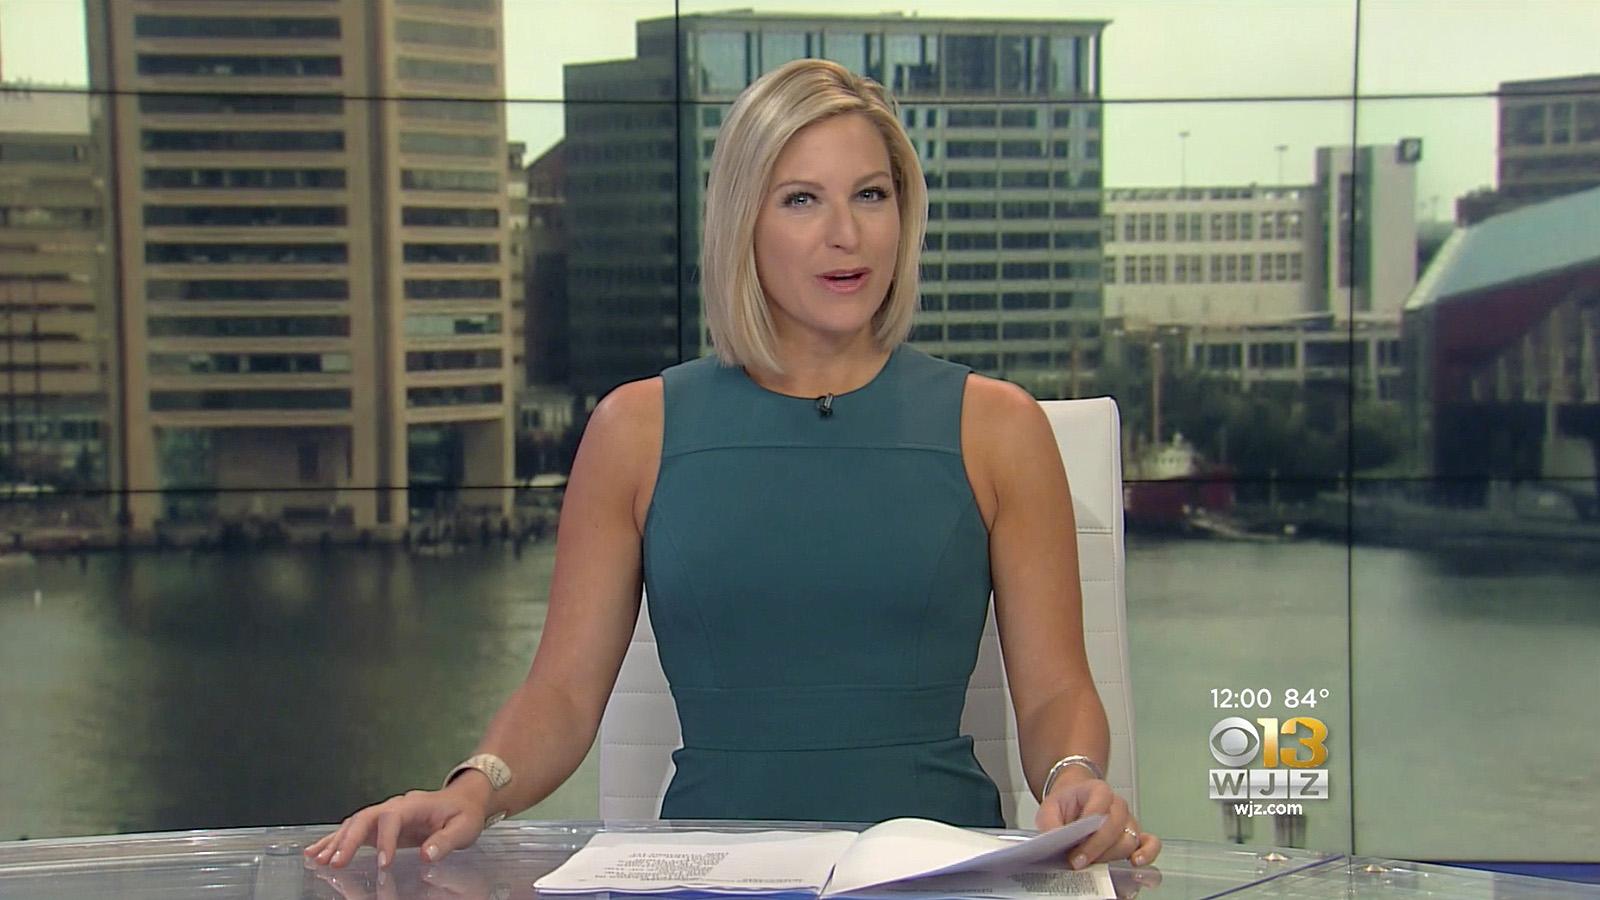 ncs_WJZ-CBS-13-Baltimore-TV-Studio_0013